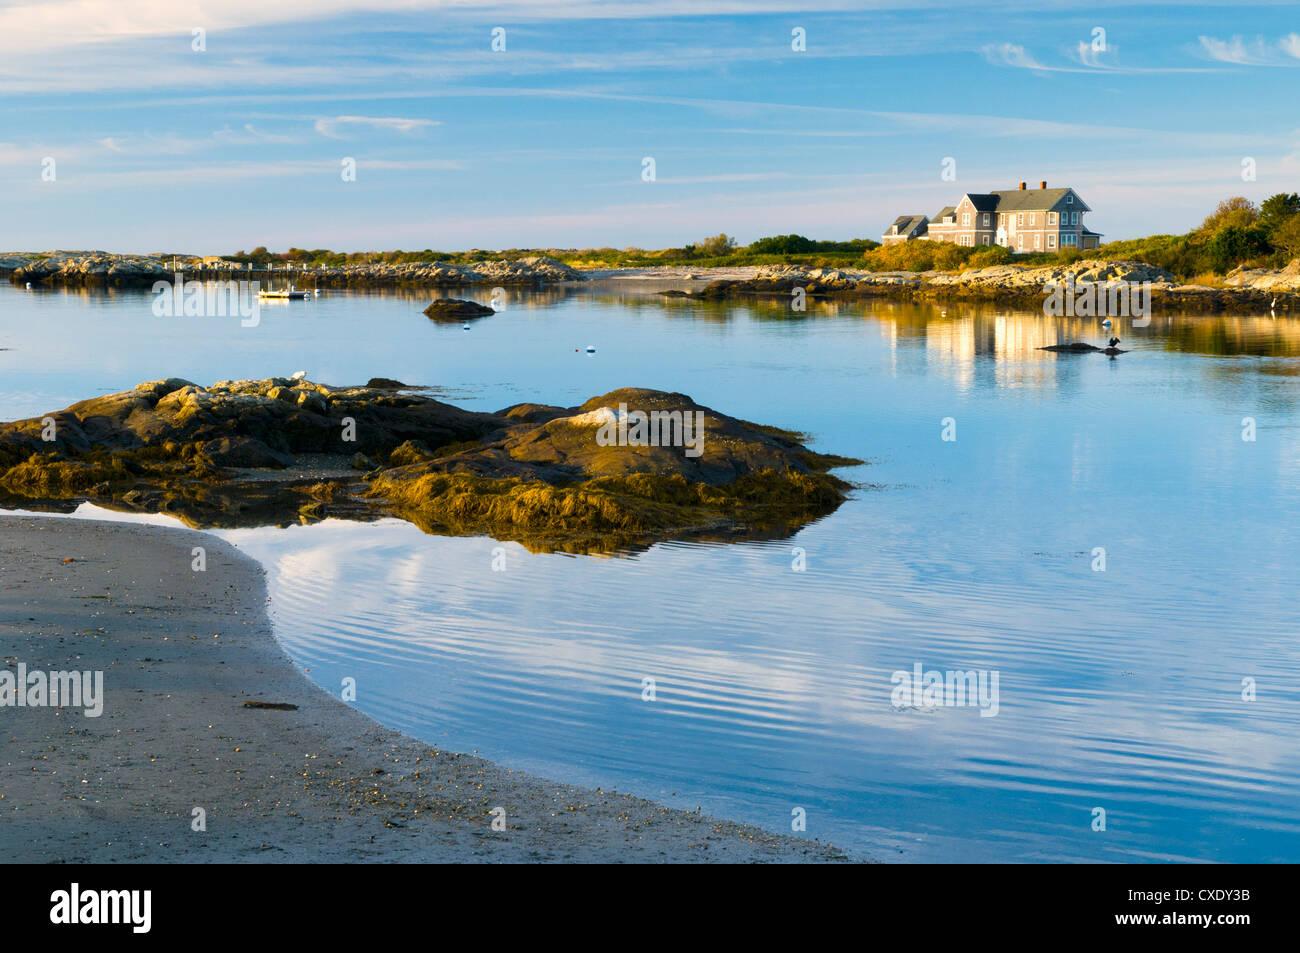 Newport, Rhode Island, New England, United States of America, North America - Stock Image